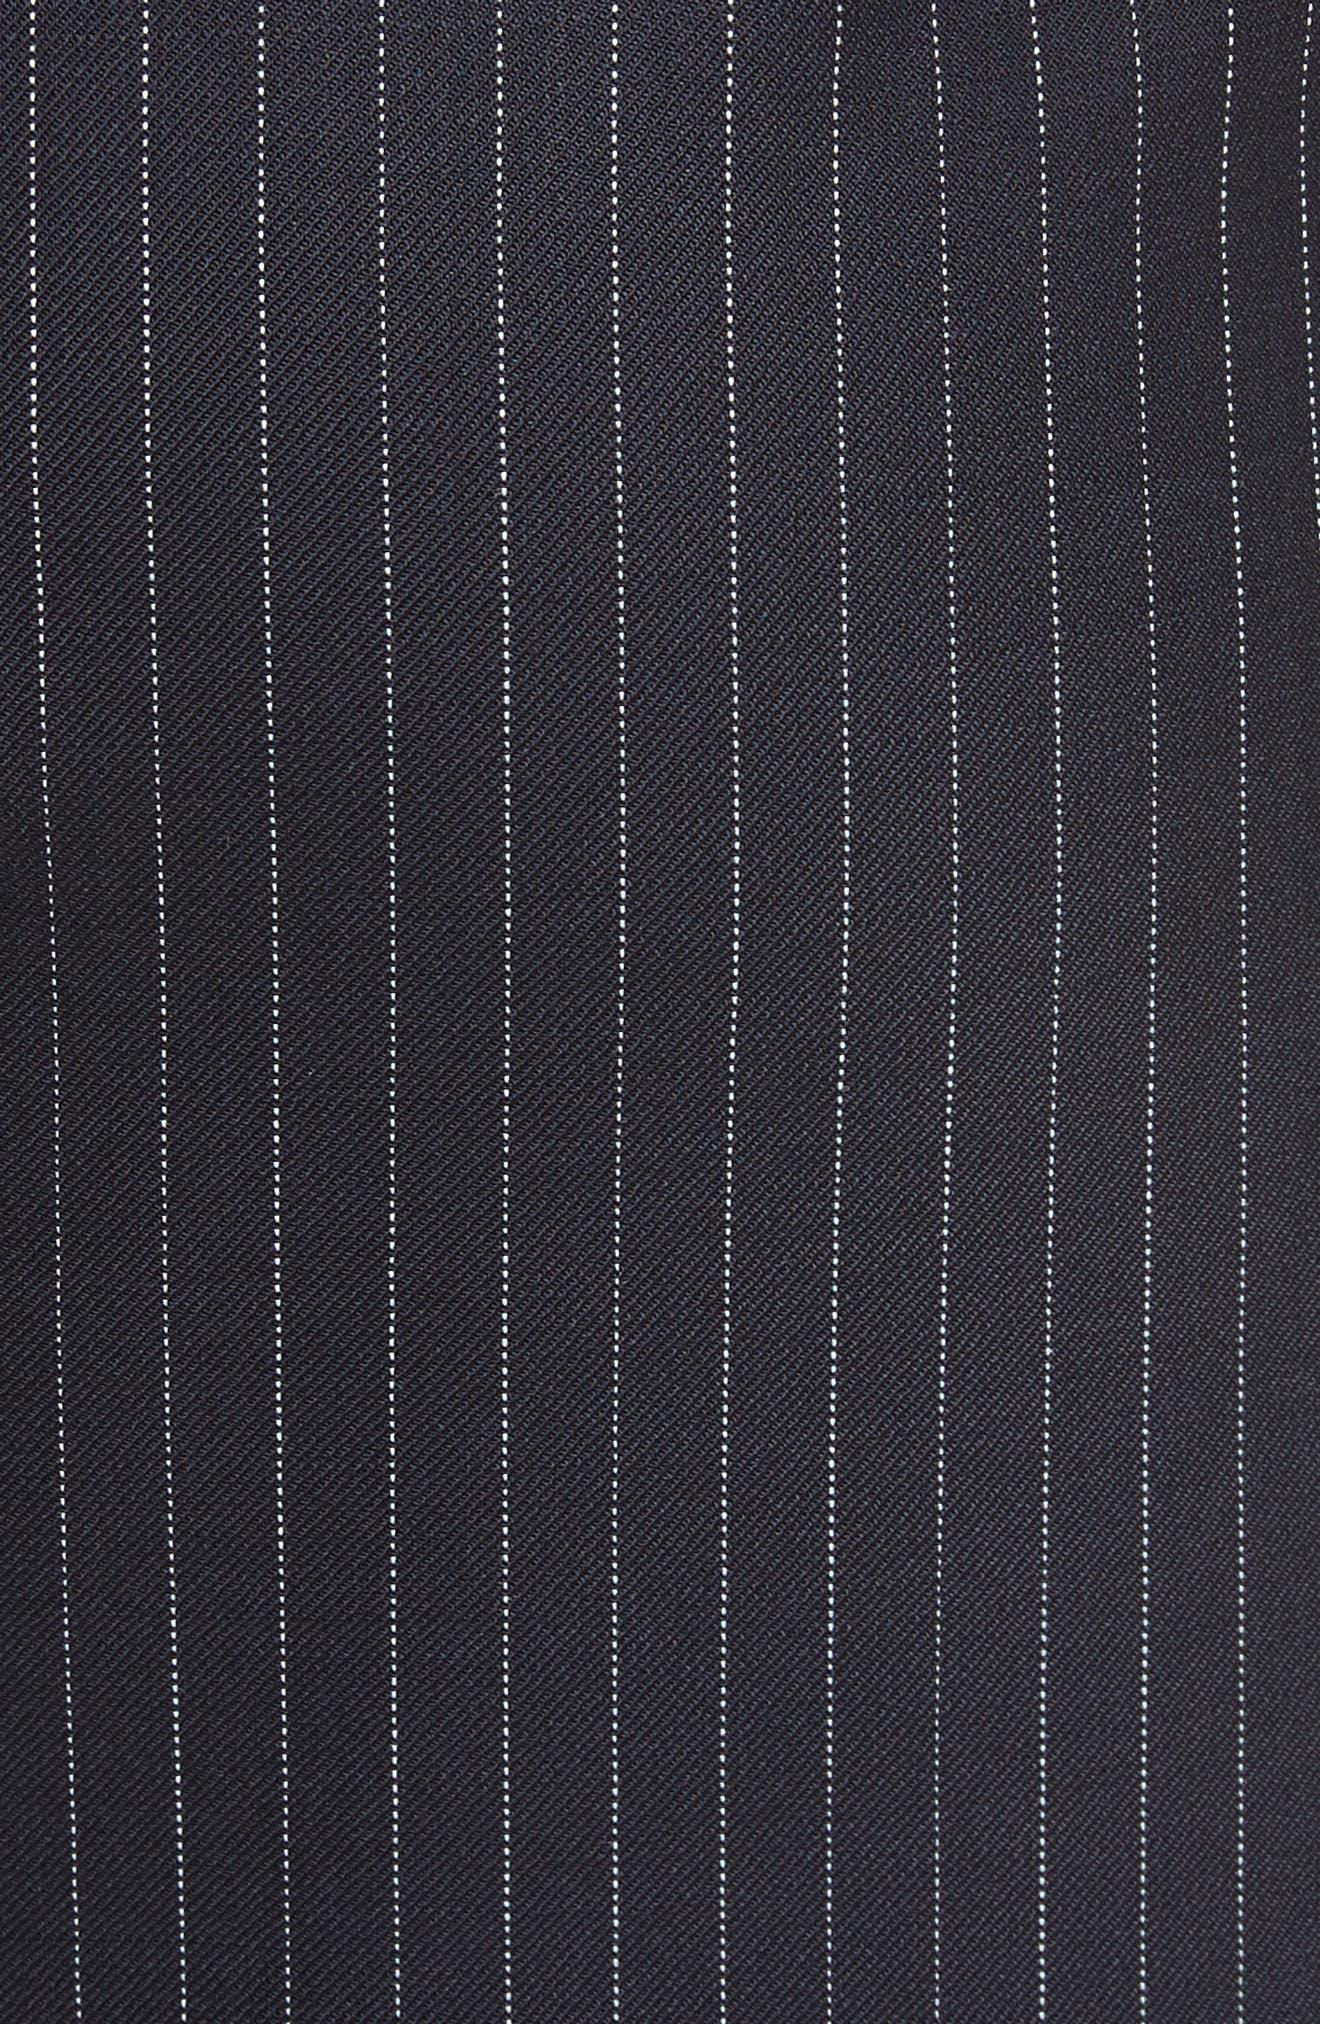 Abba Pinstripe Pencil Skirt,                             Alternate thumbnail 5, color,                             411